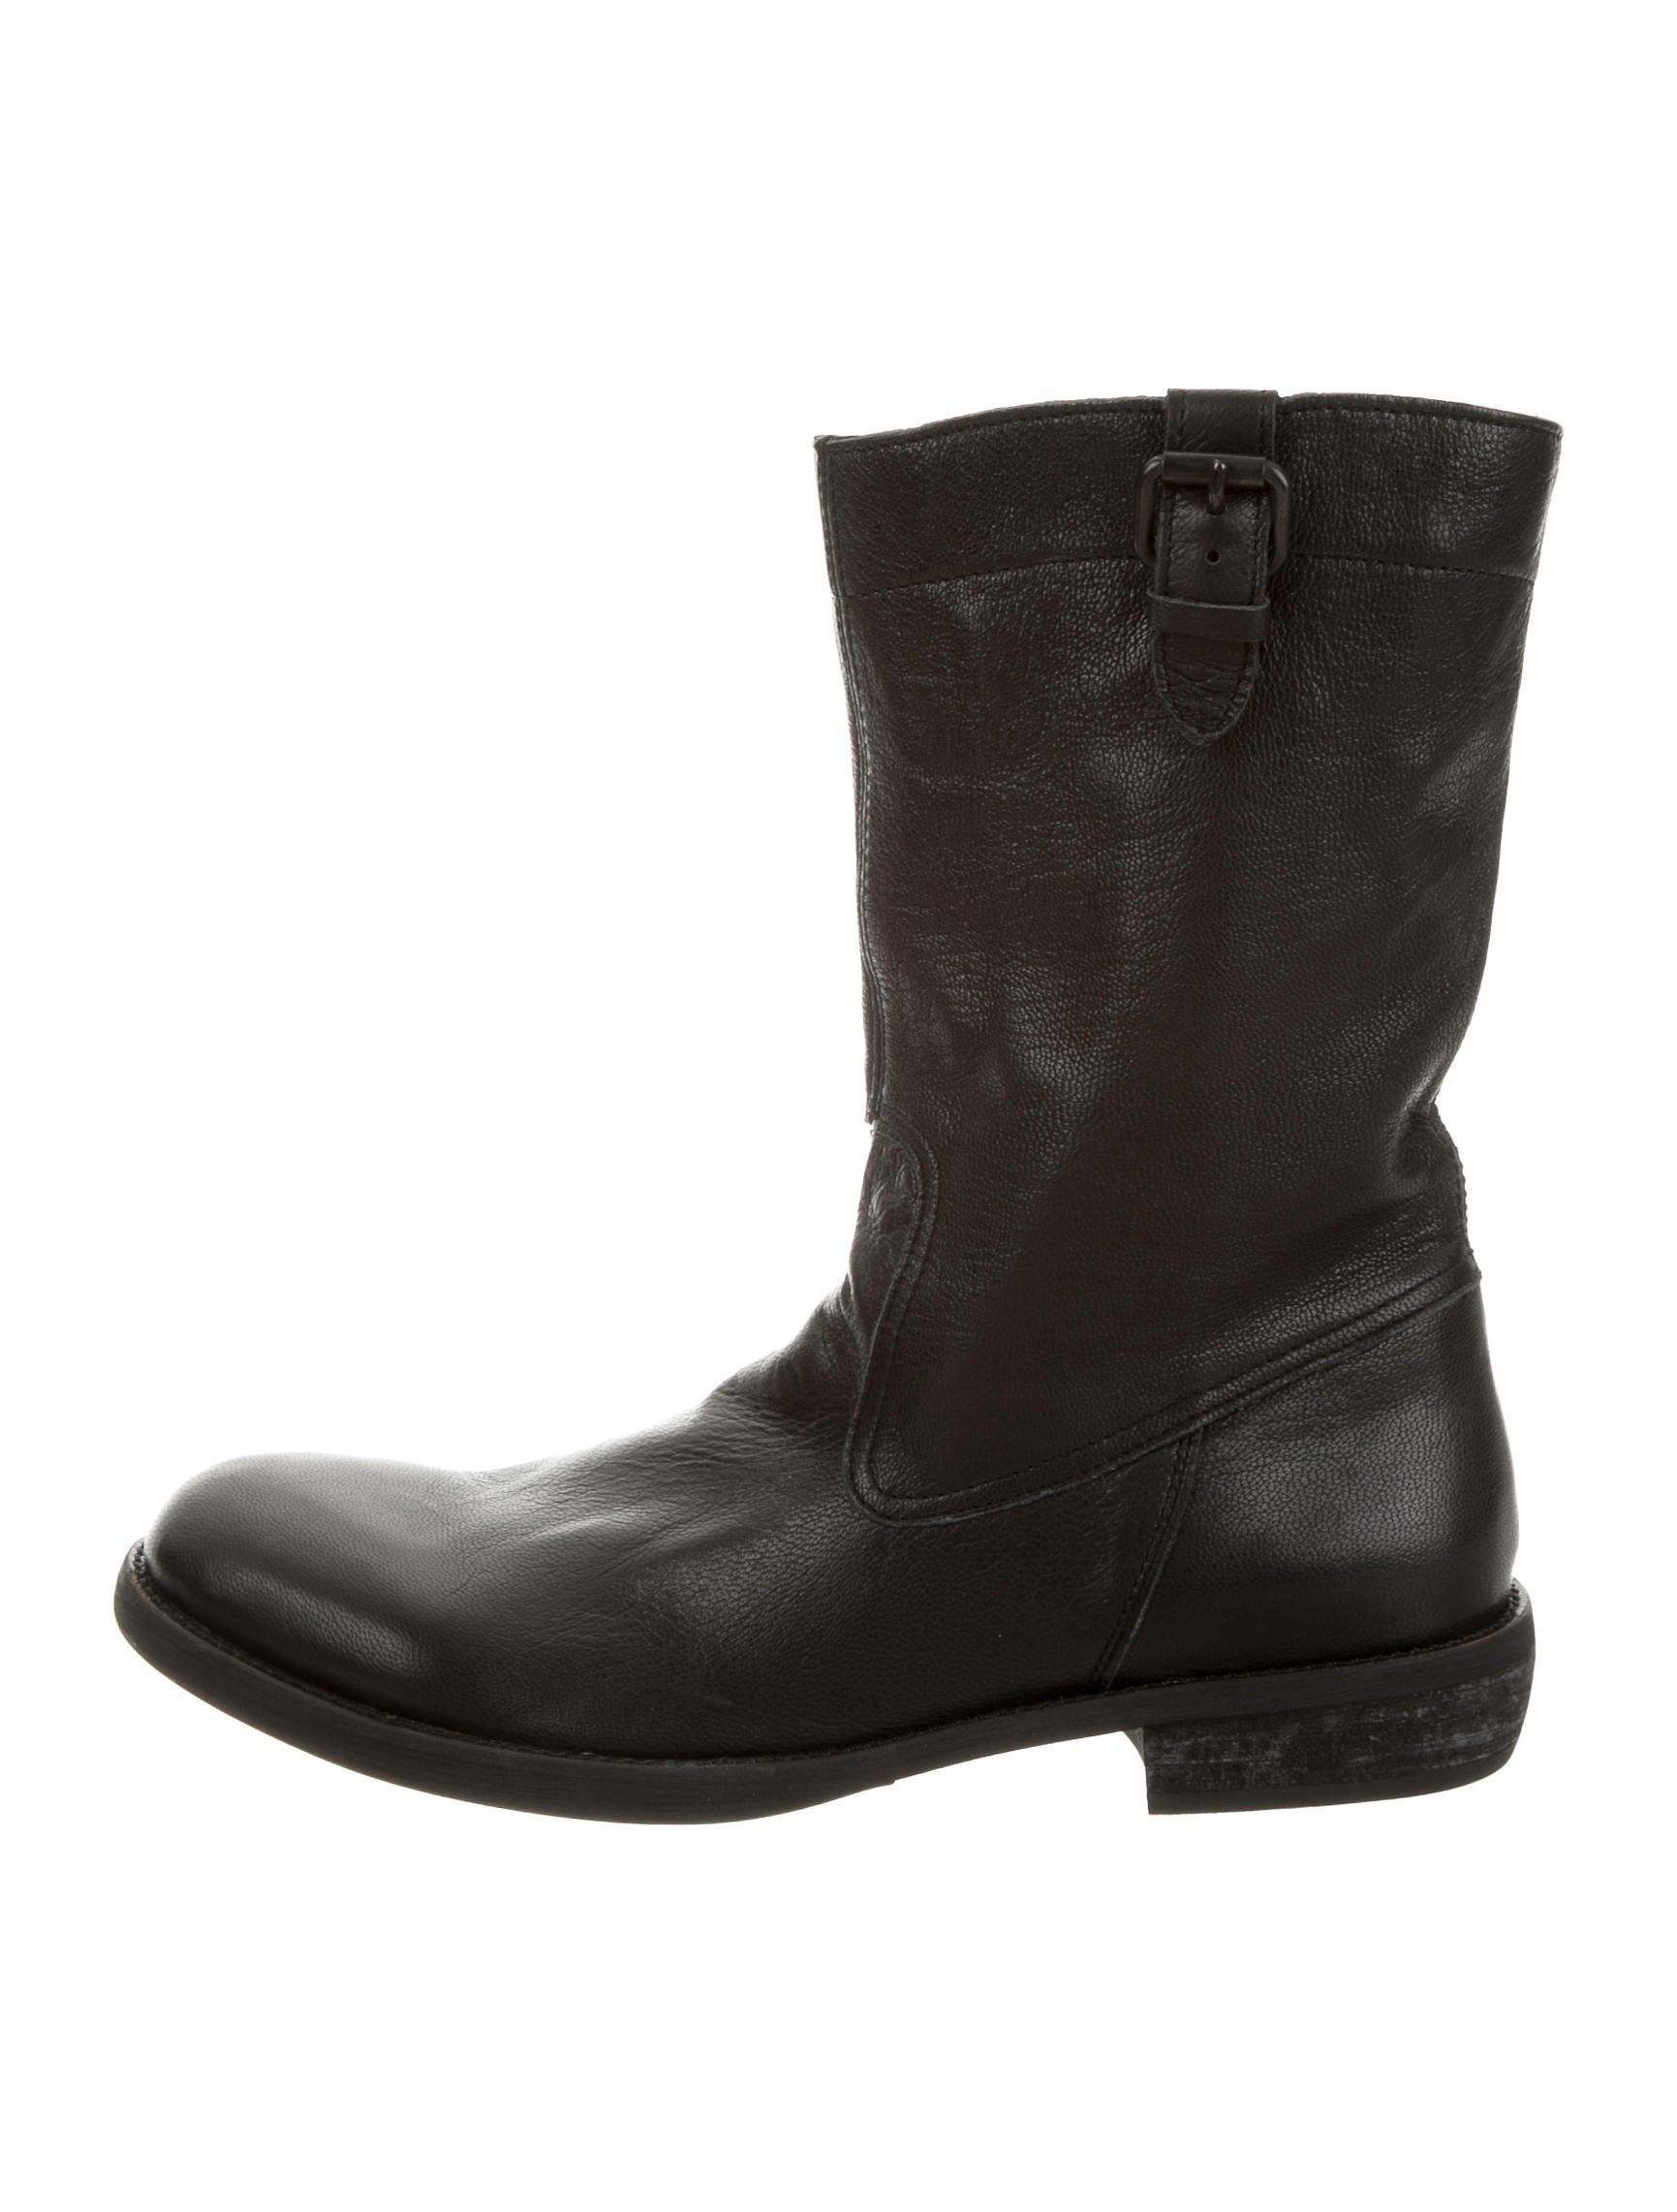 buy cheap Inexpensive discount 2014 unisex Yohji Yamamoto Leather Mid-Calf Boots GXXAU4on9u